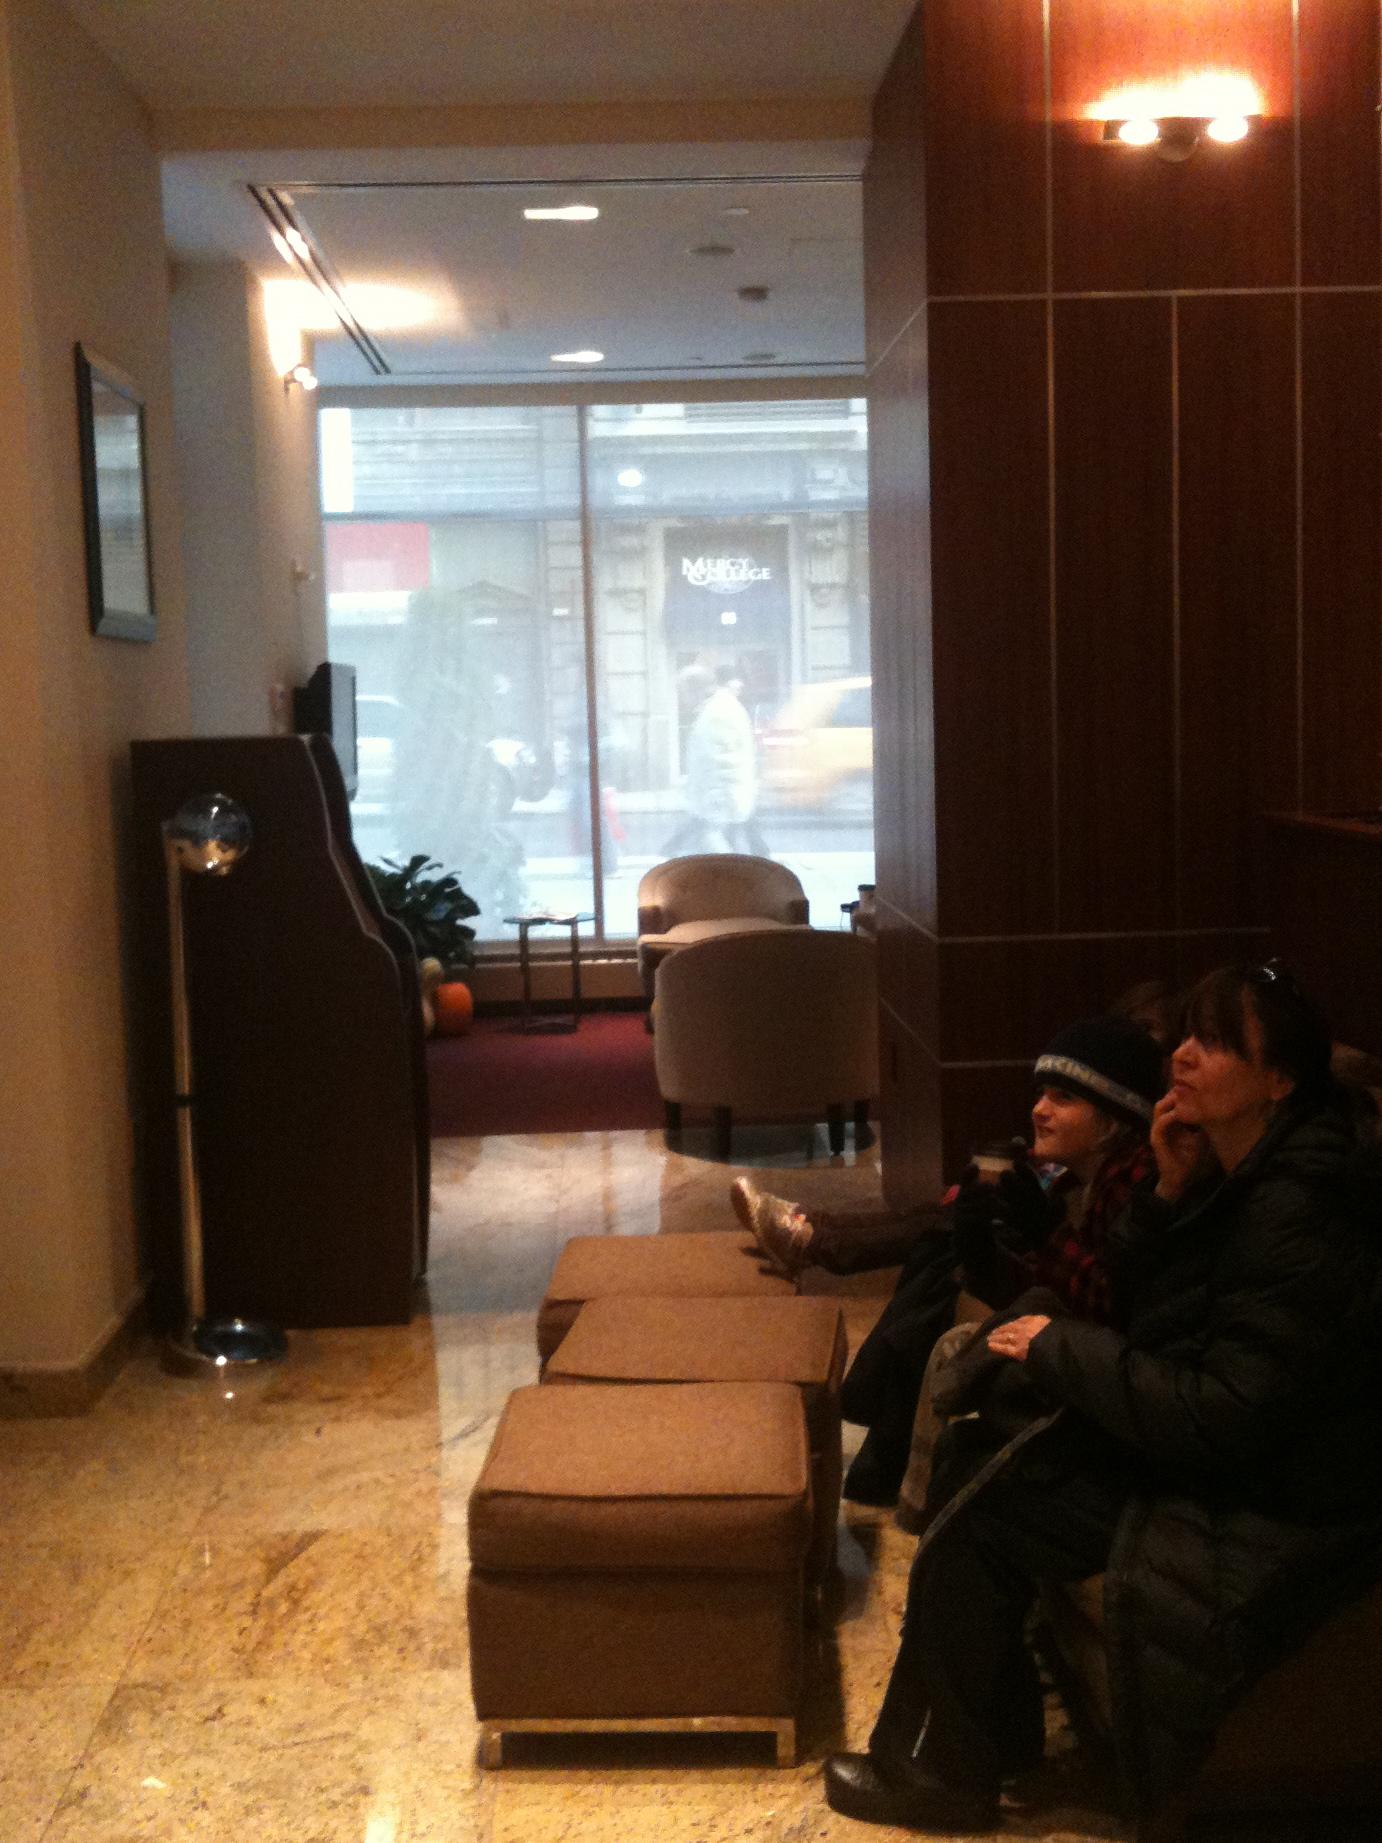 Hotel Review Hilton Garden Inn W 35th St NYC